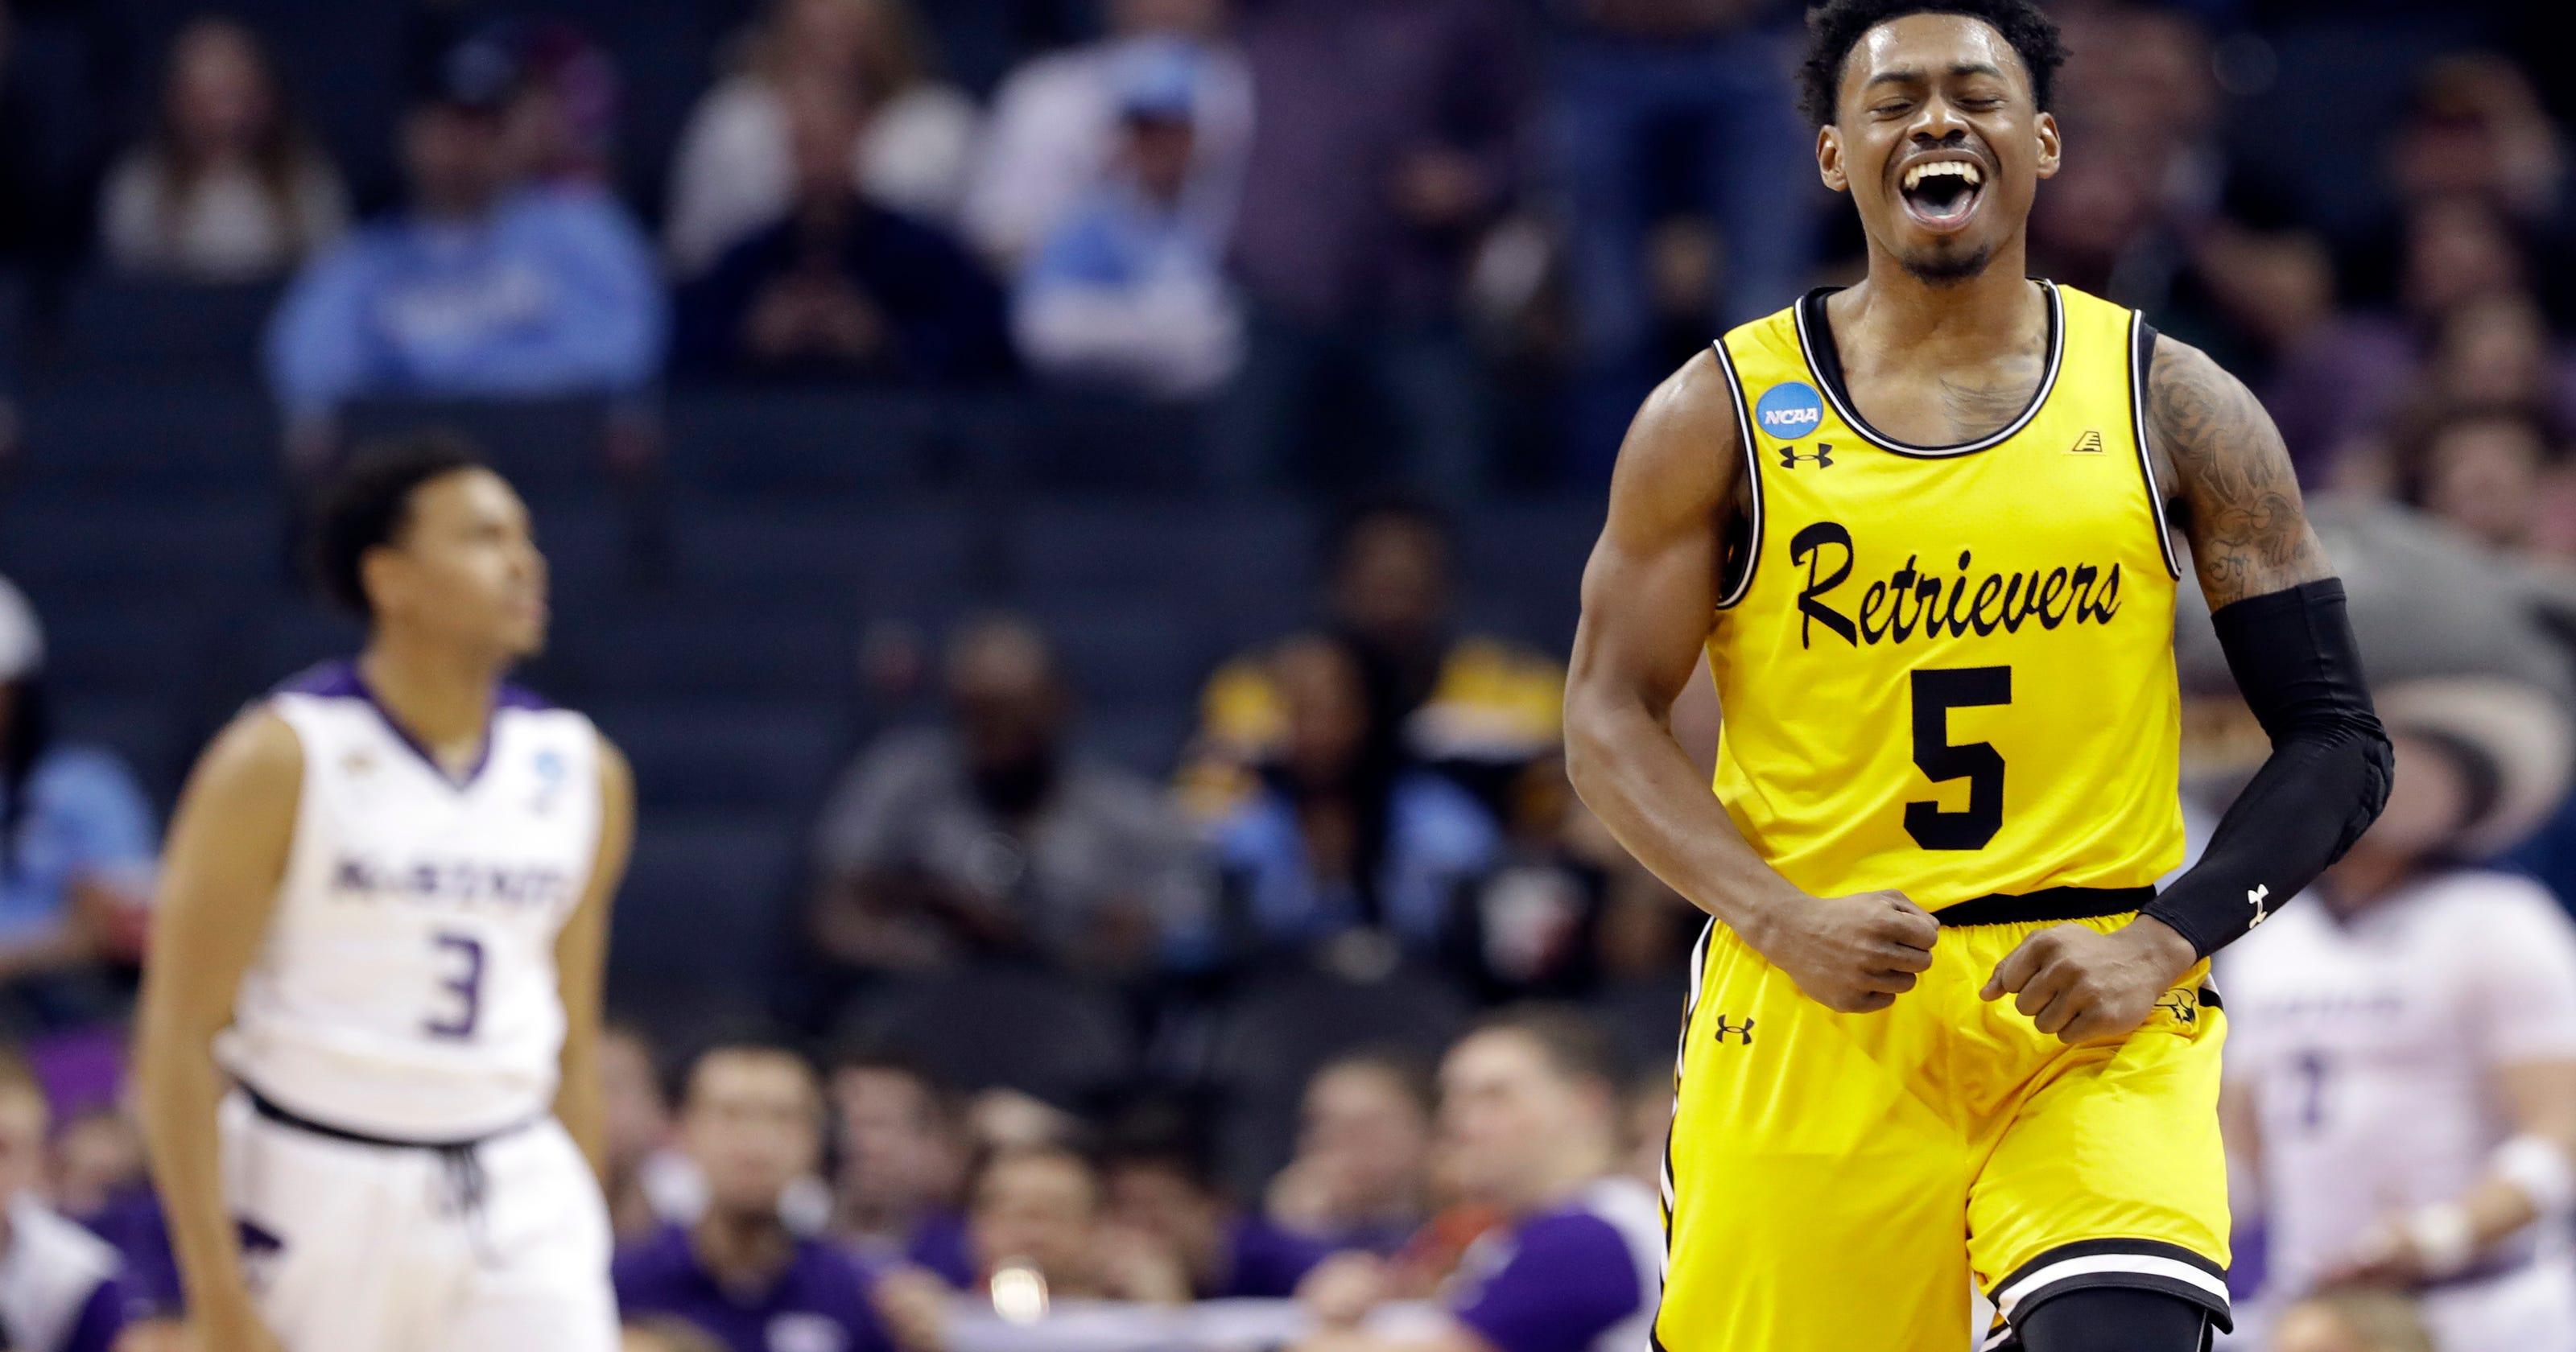 What's an NCAA Tournament upset worth? Units = big bucks